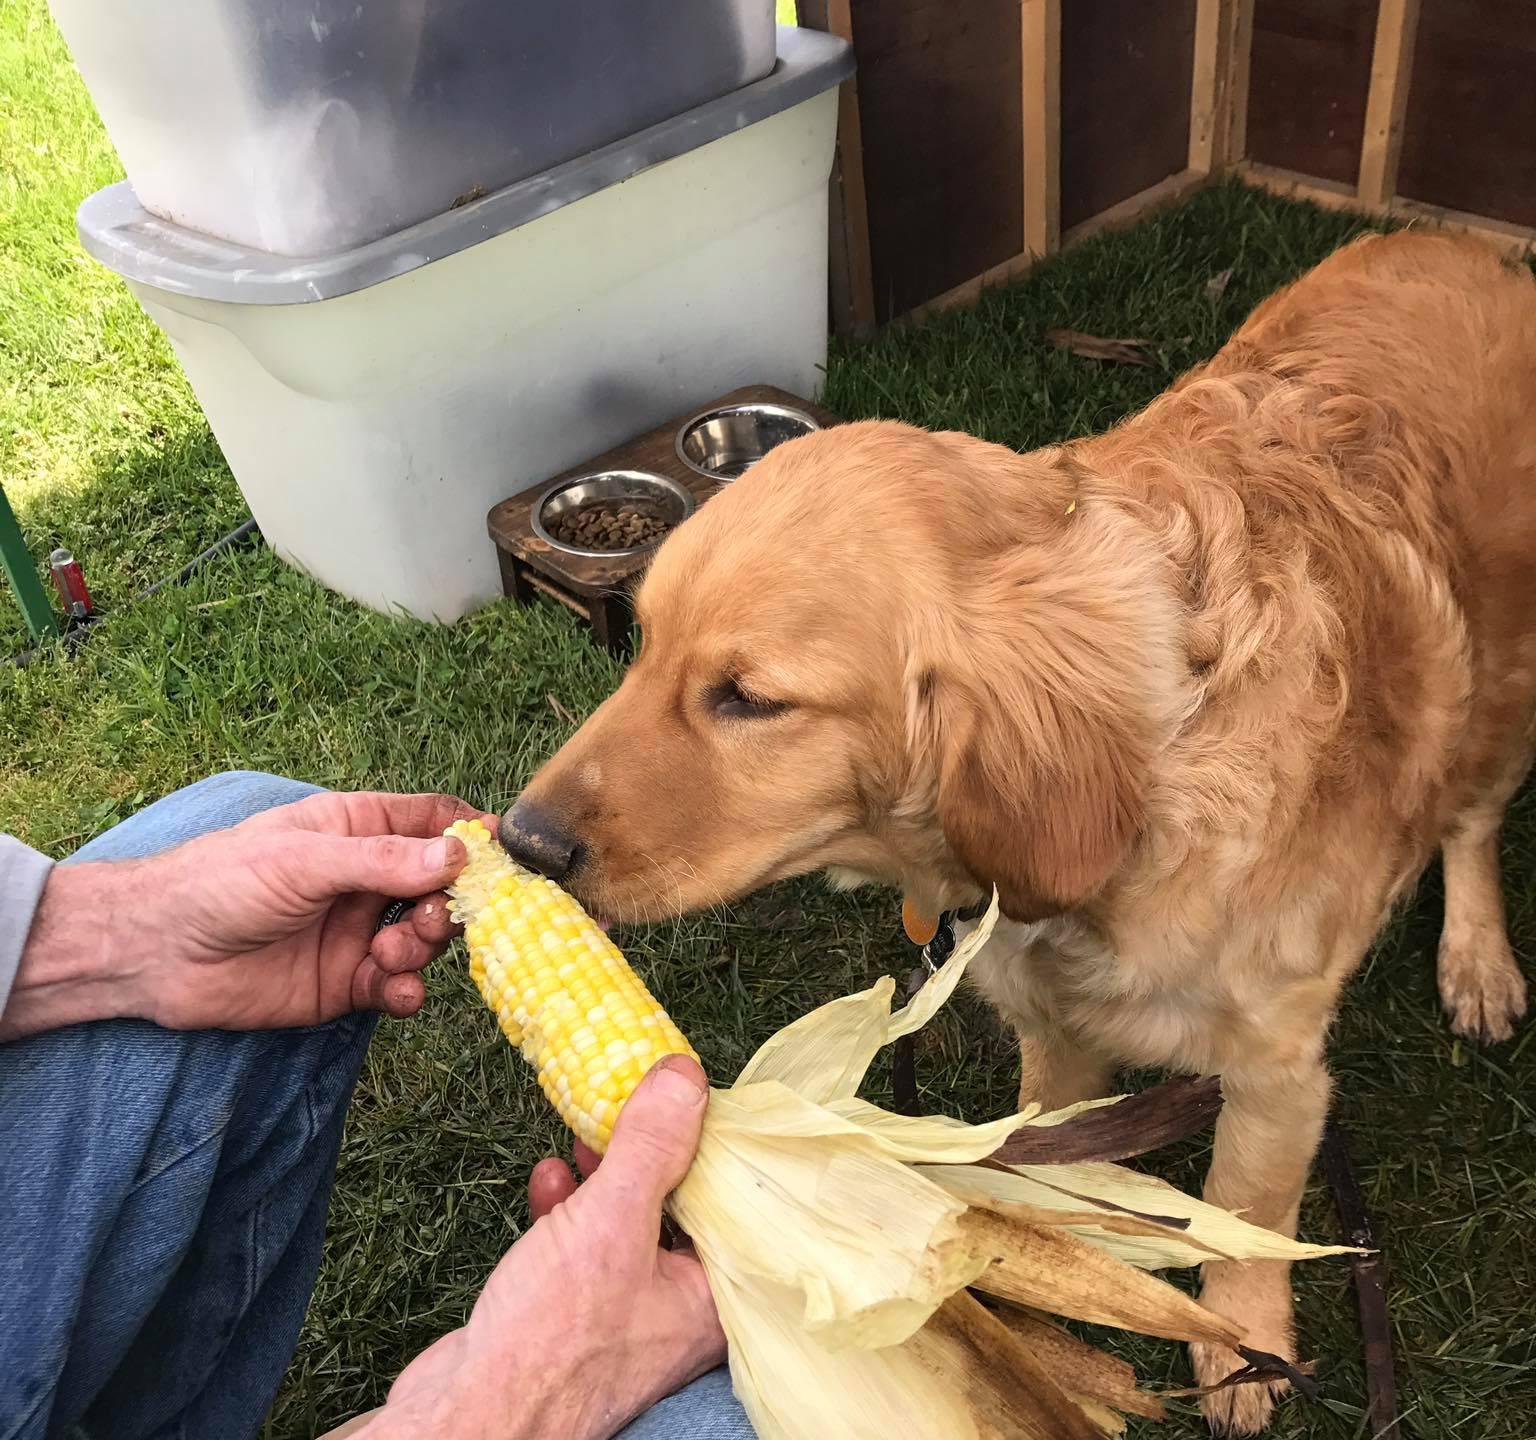 Pup enjoying a healthy snack